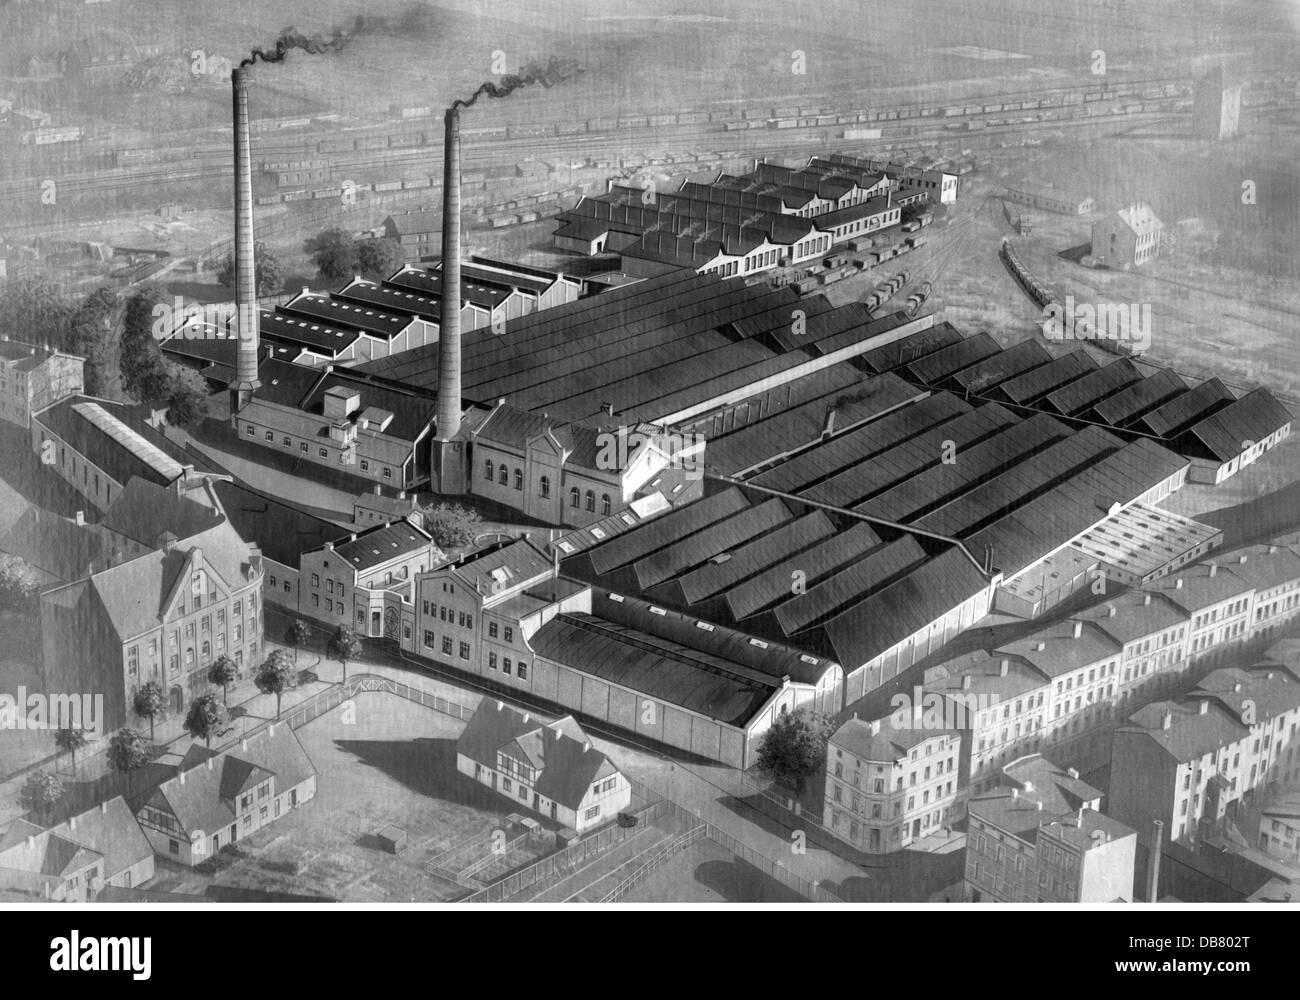 geography / travel, Germany, Hamburg - Harburg, buildings, jute mill of the Vereinigte Jute-Spinnereien und Webereien Stock Photo